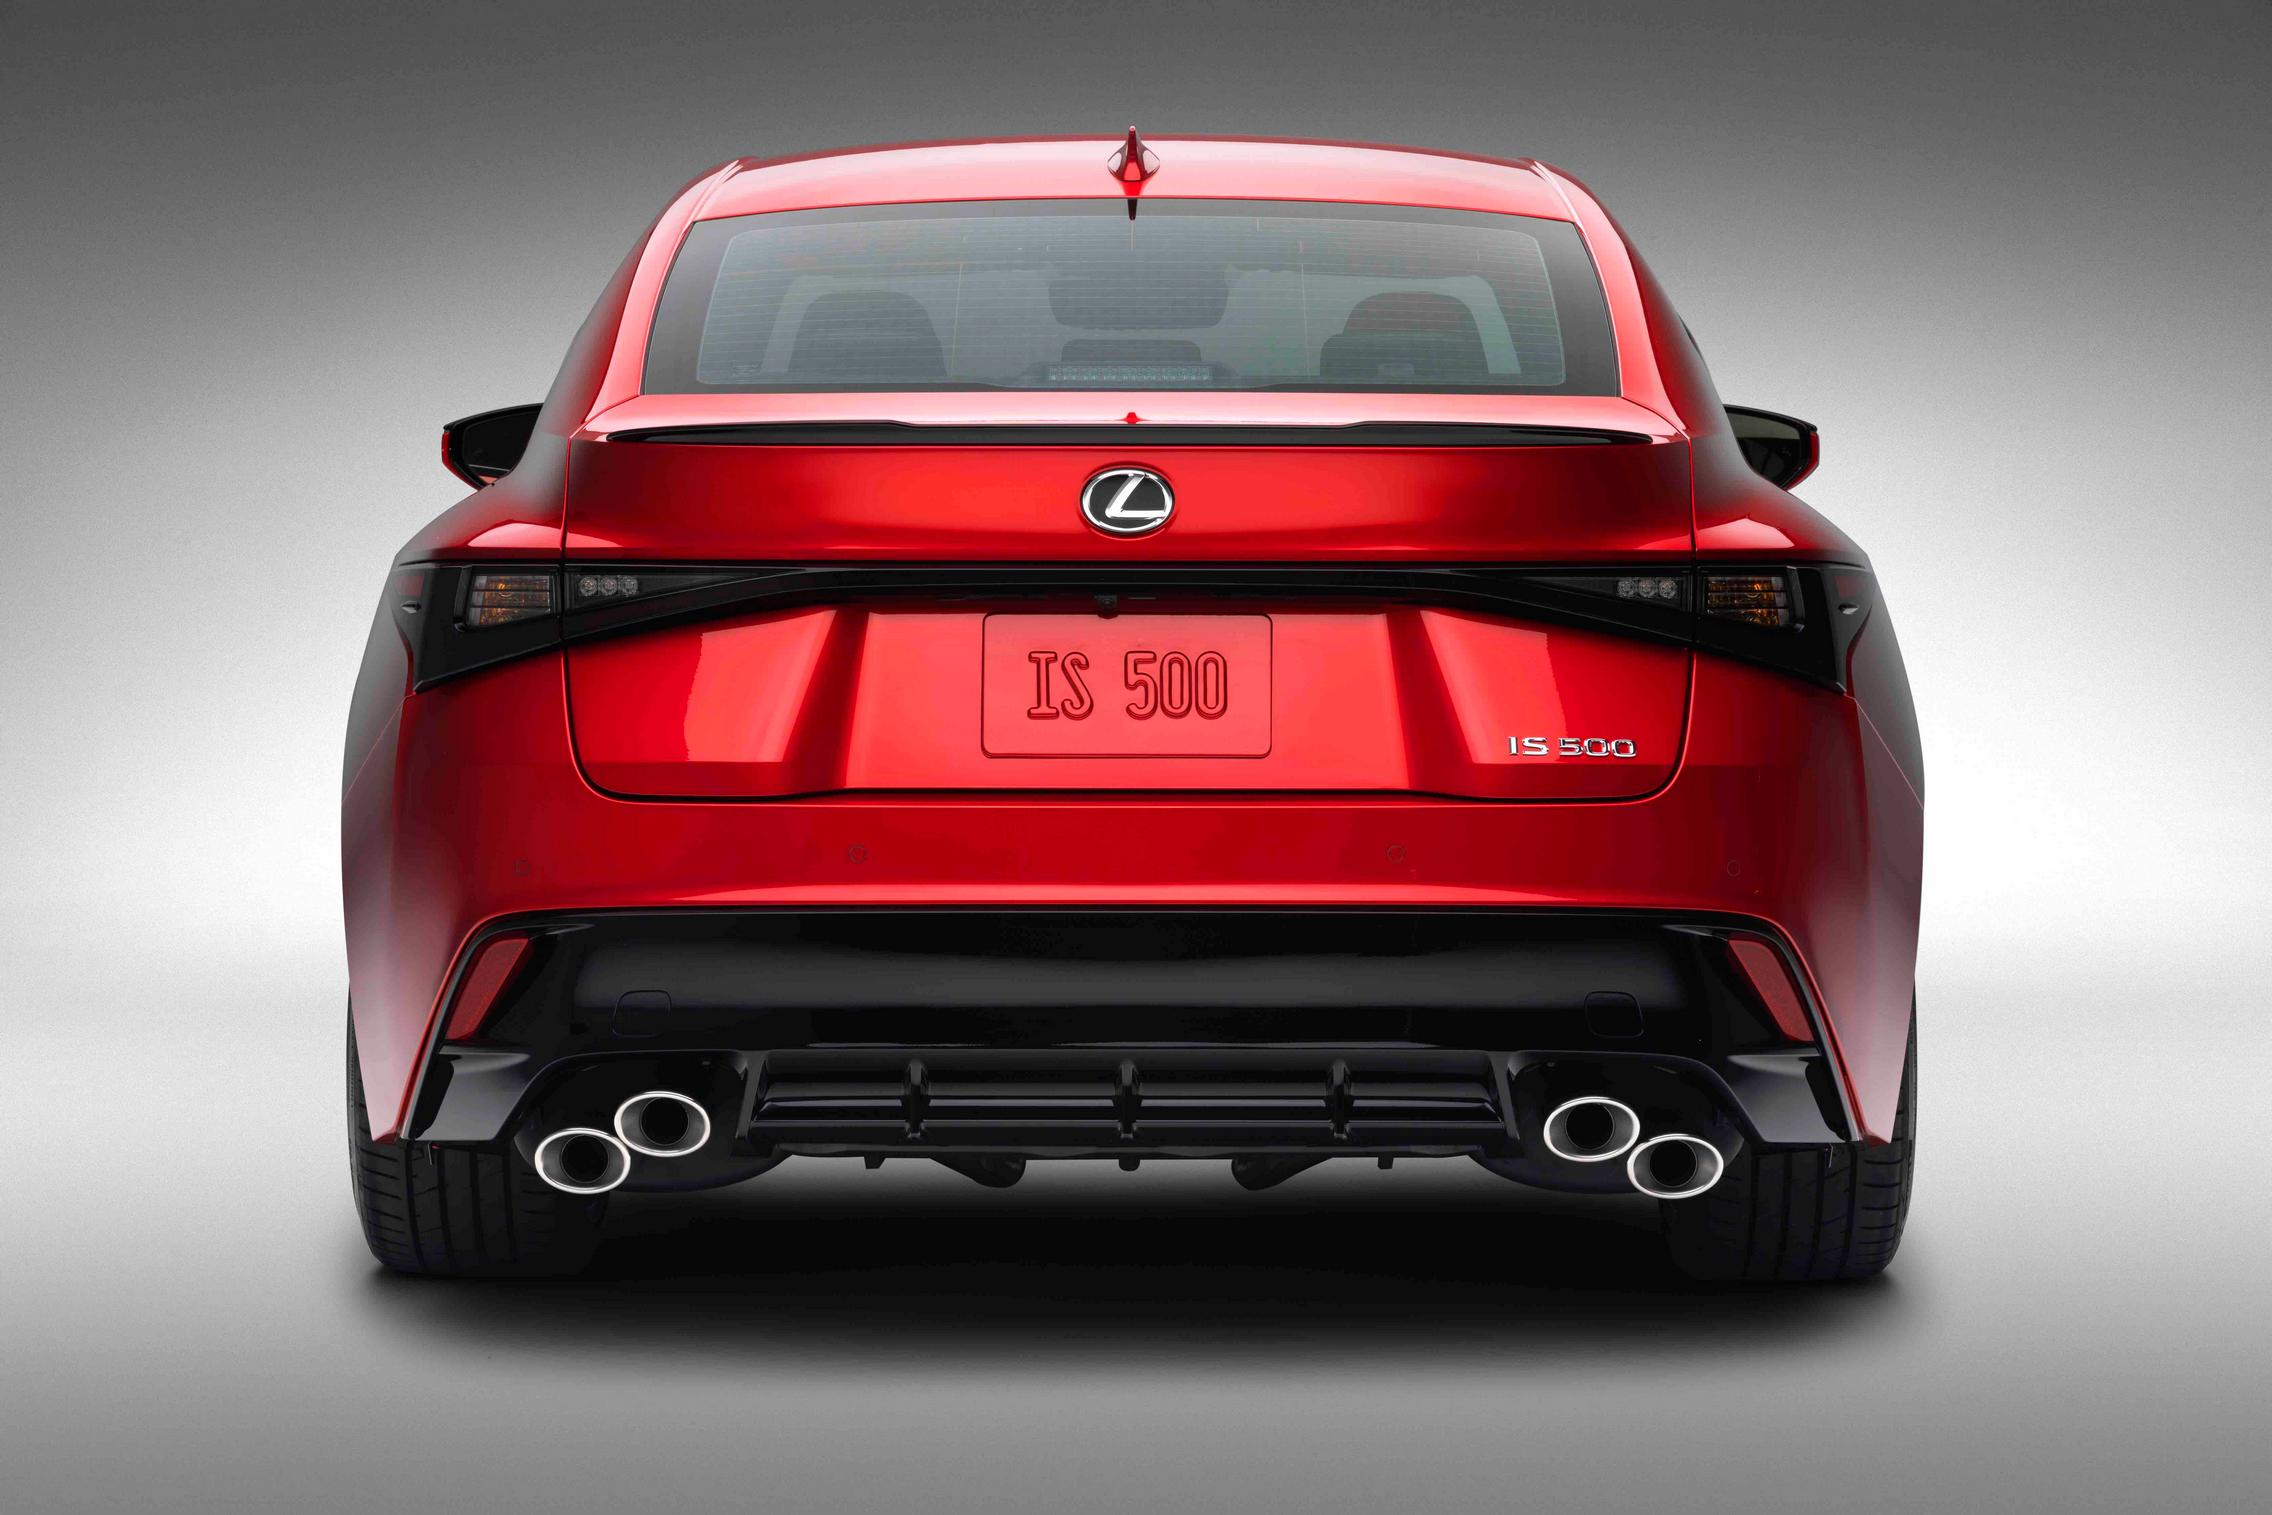 2022 Lexus IS 500 F Sport Performance rear lights